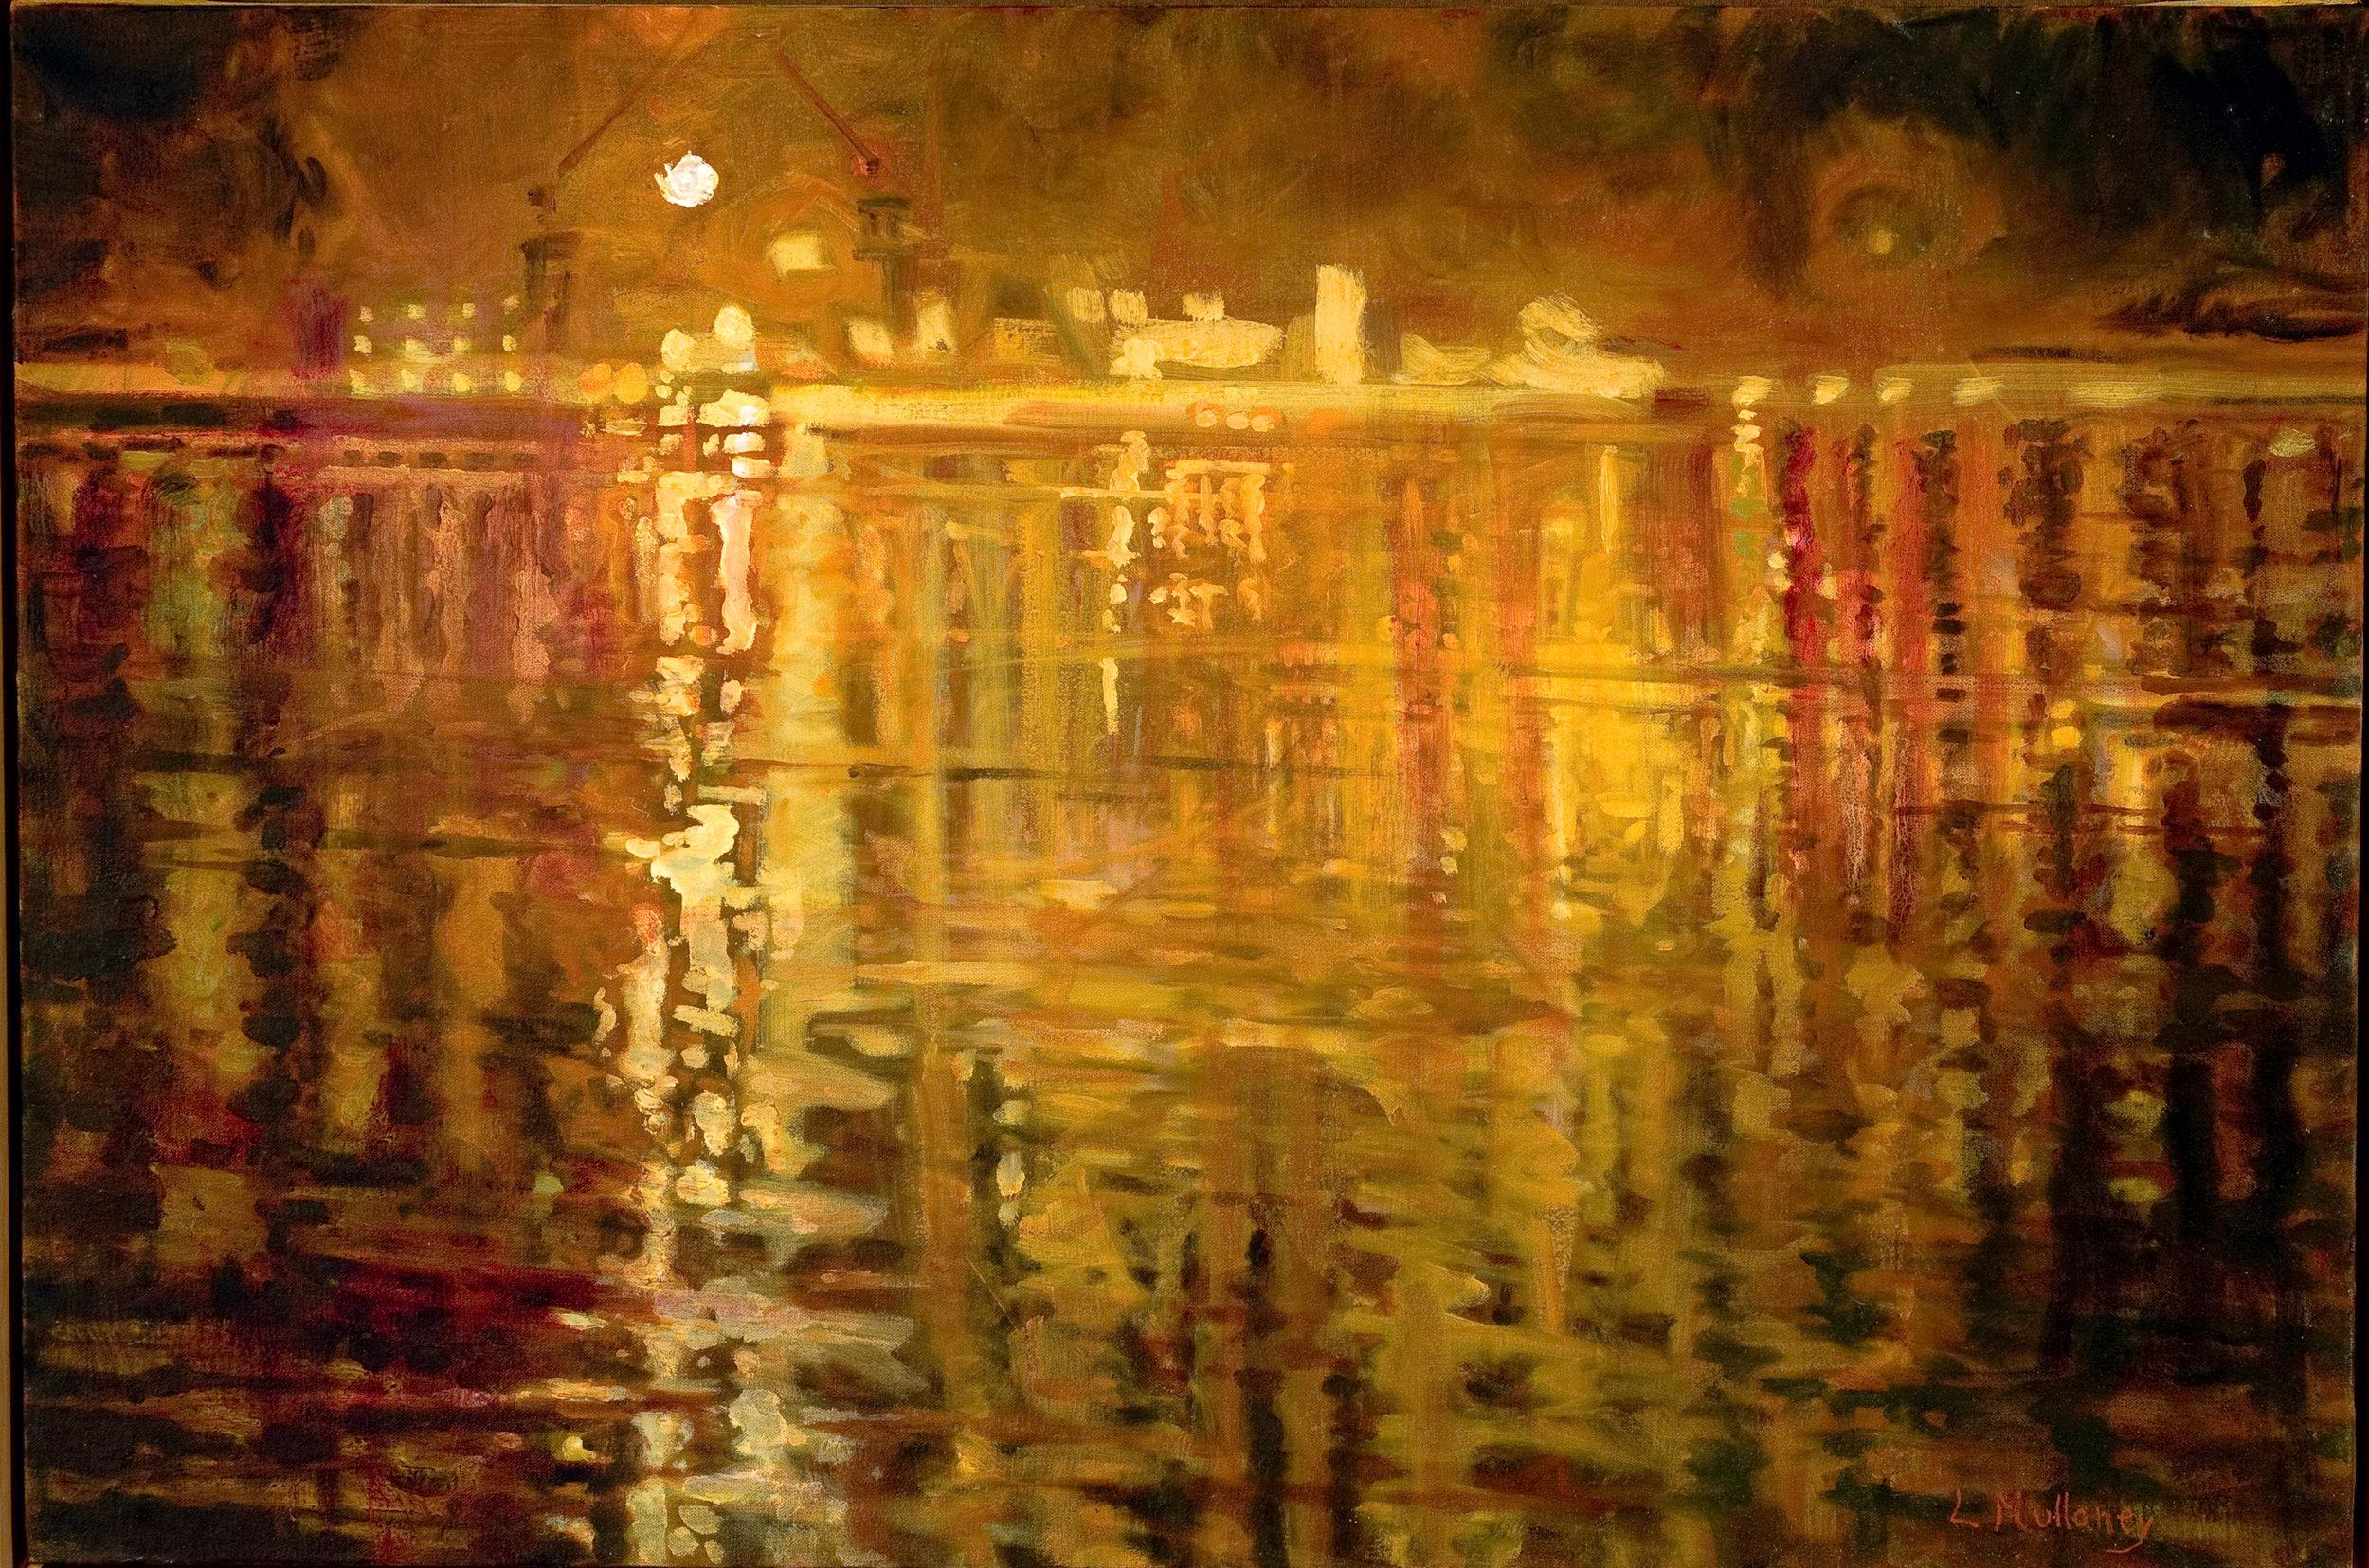 Shipyard Lights, oils, 18 x 20